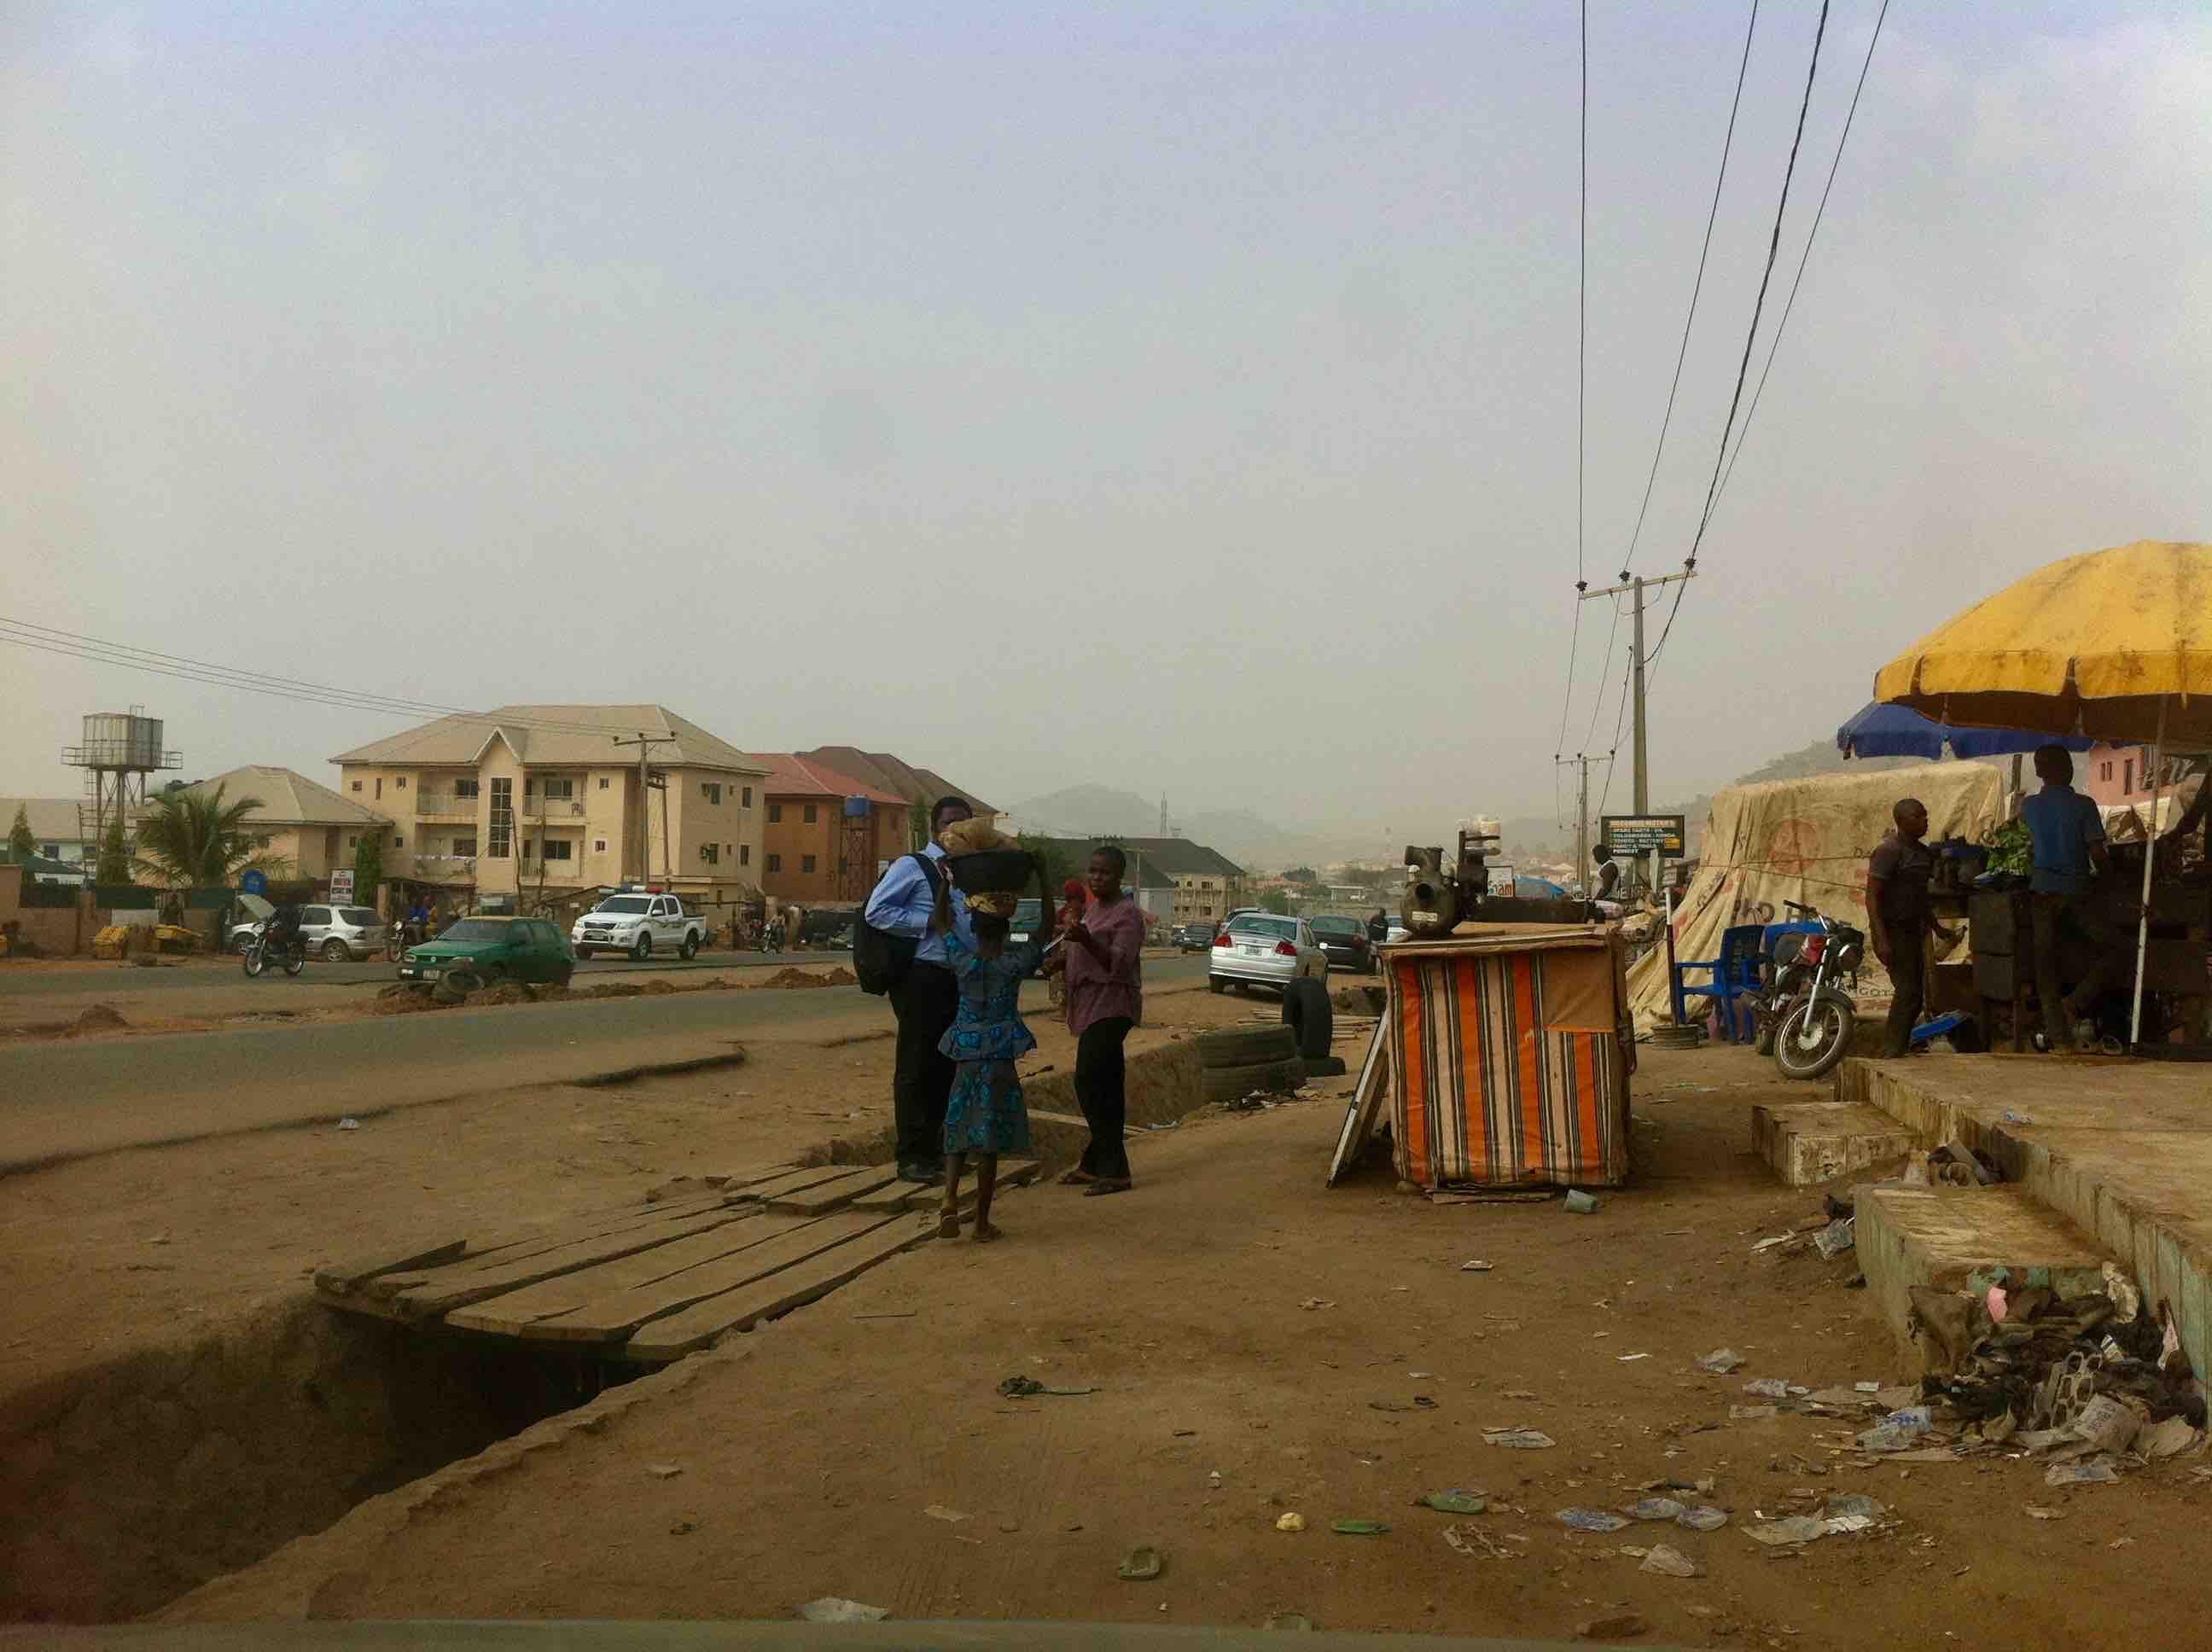 Street scene, Dutse, Abuja, Nigeria. #JujuFilms